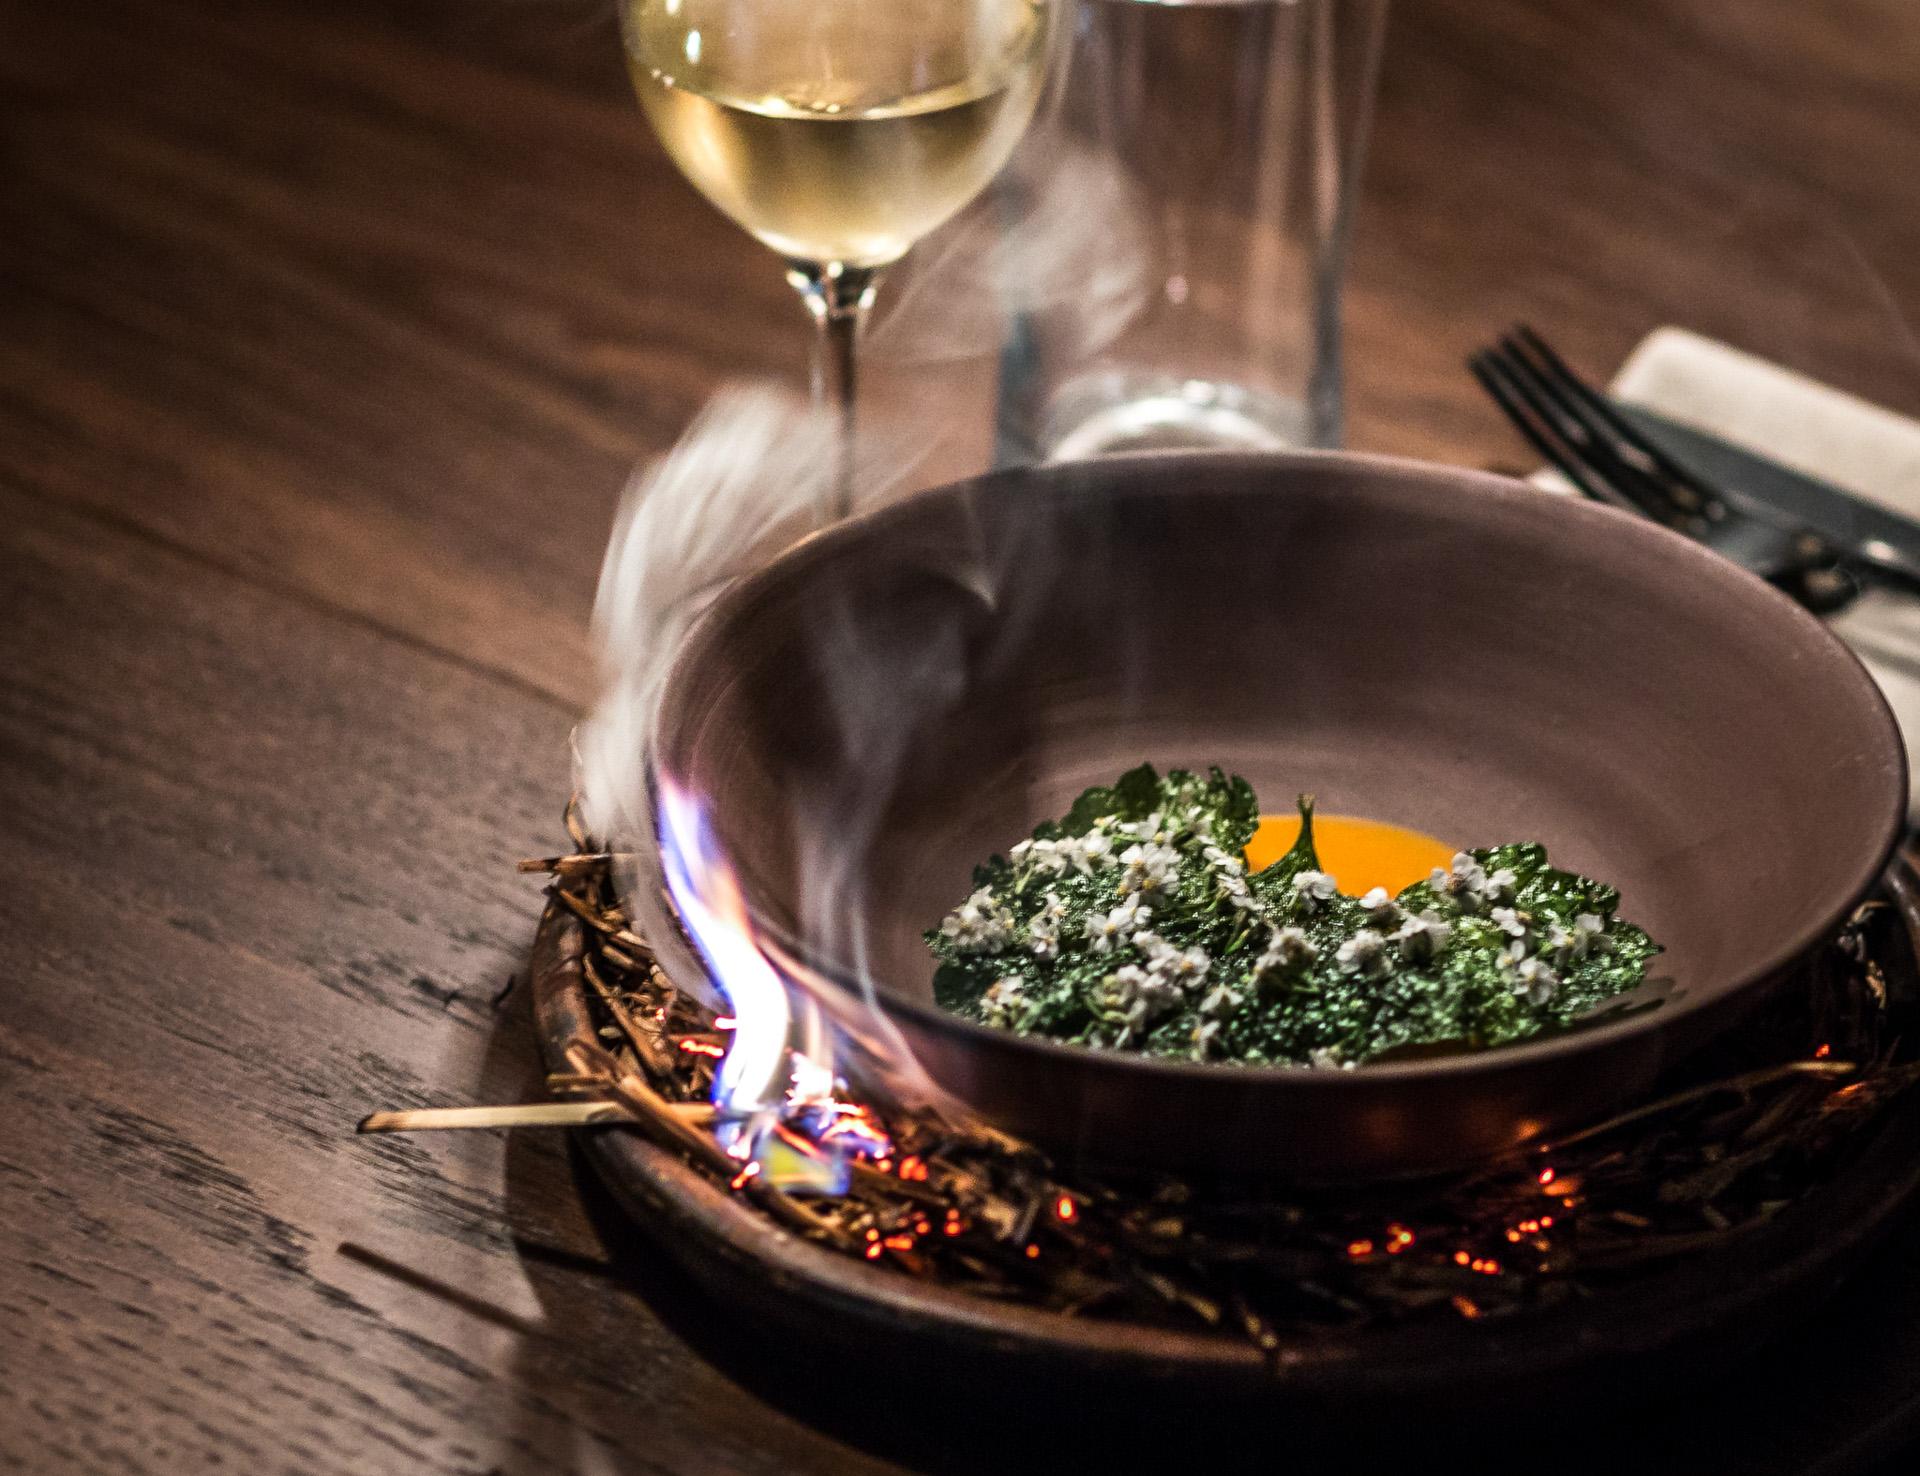 Top 5 i Jylland: Restaurant på Mols napper 1. pladsen